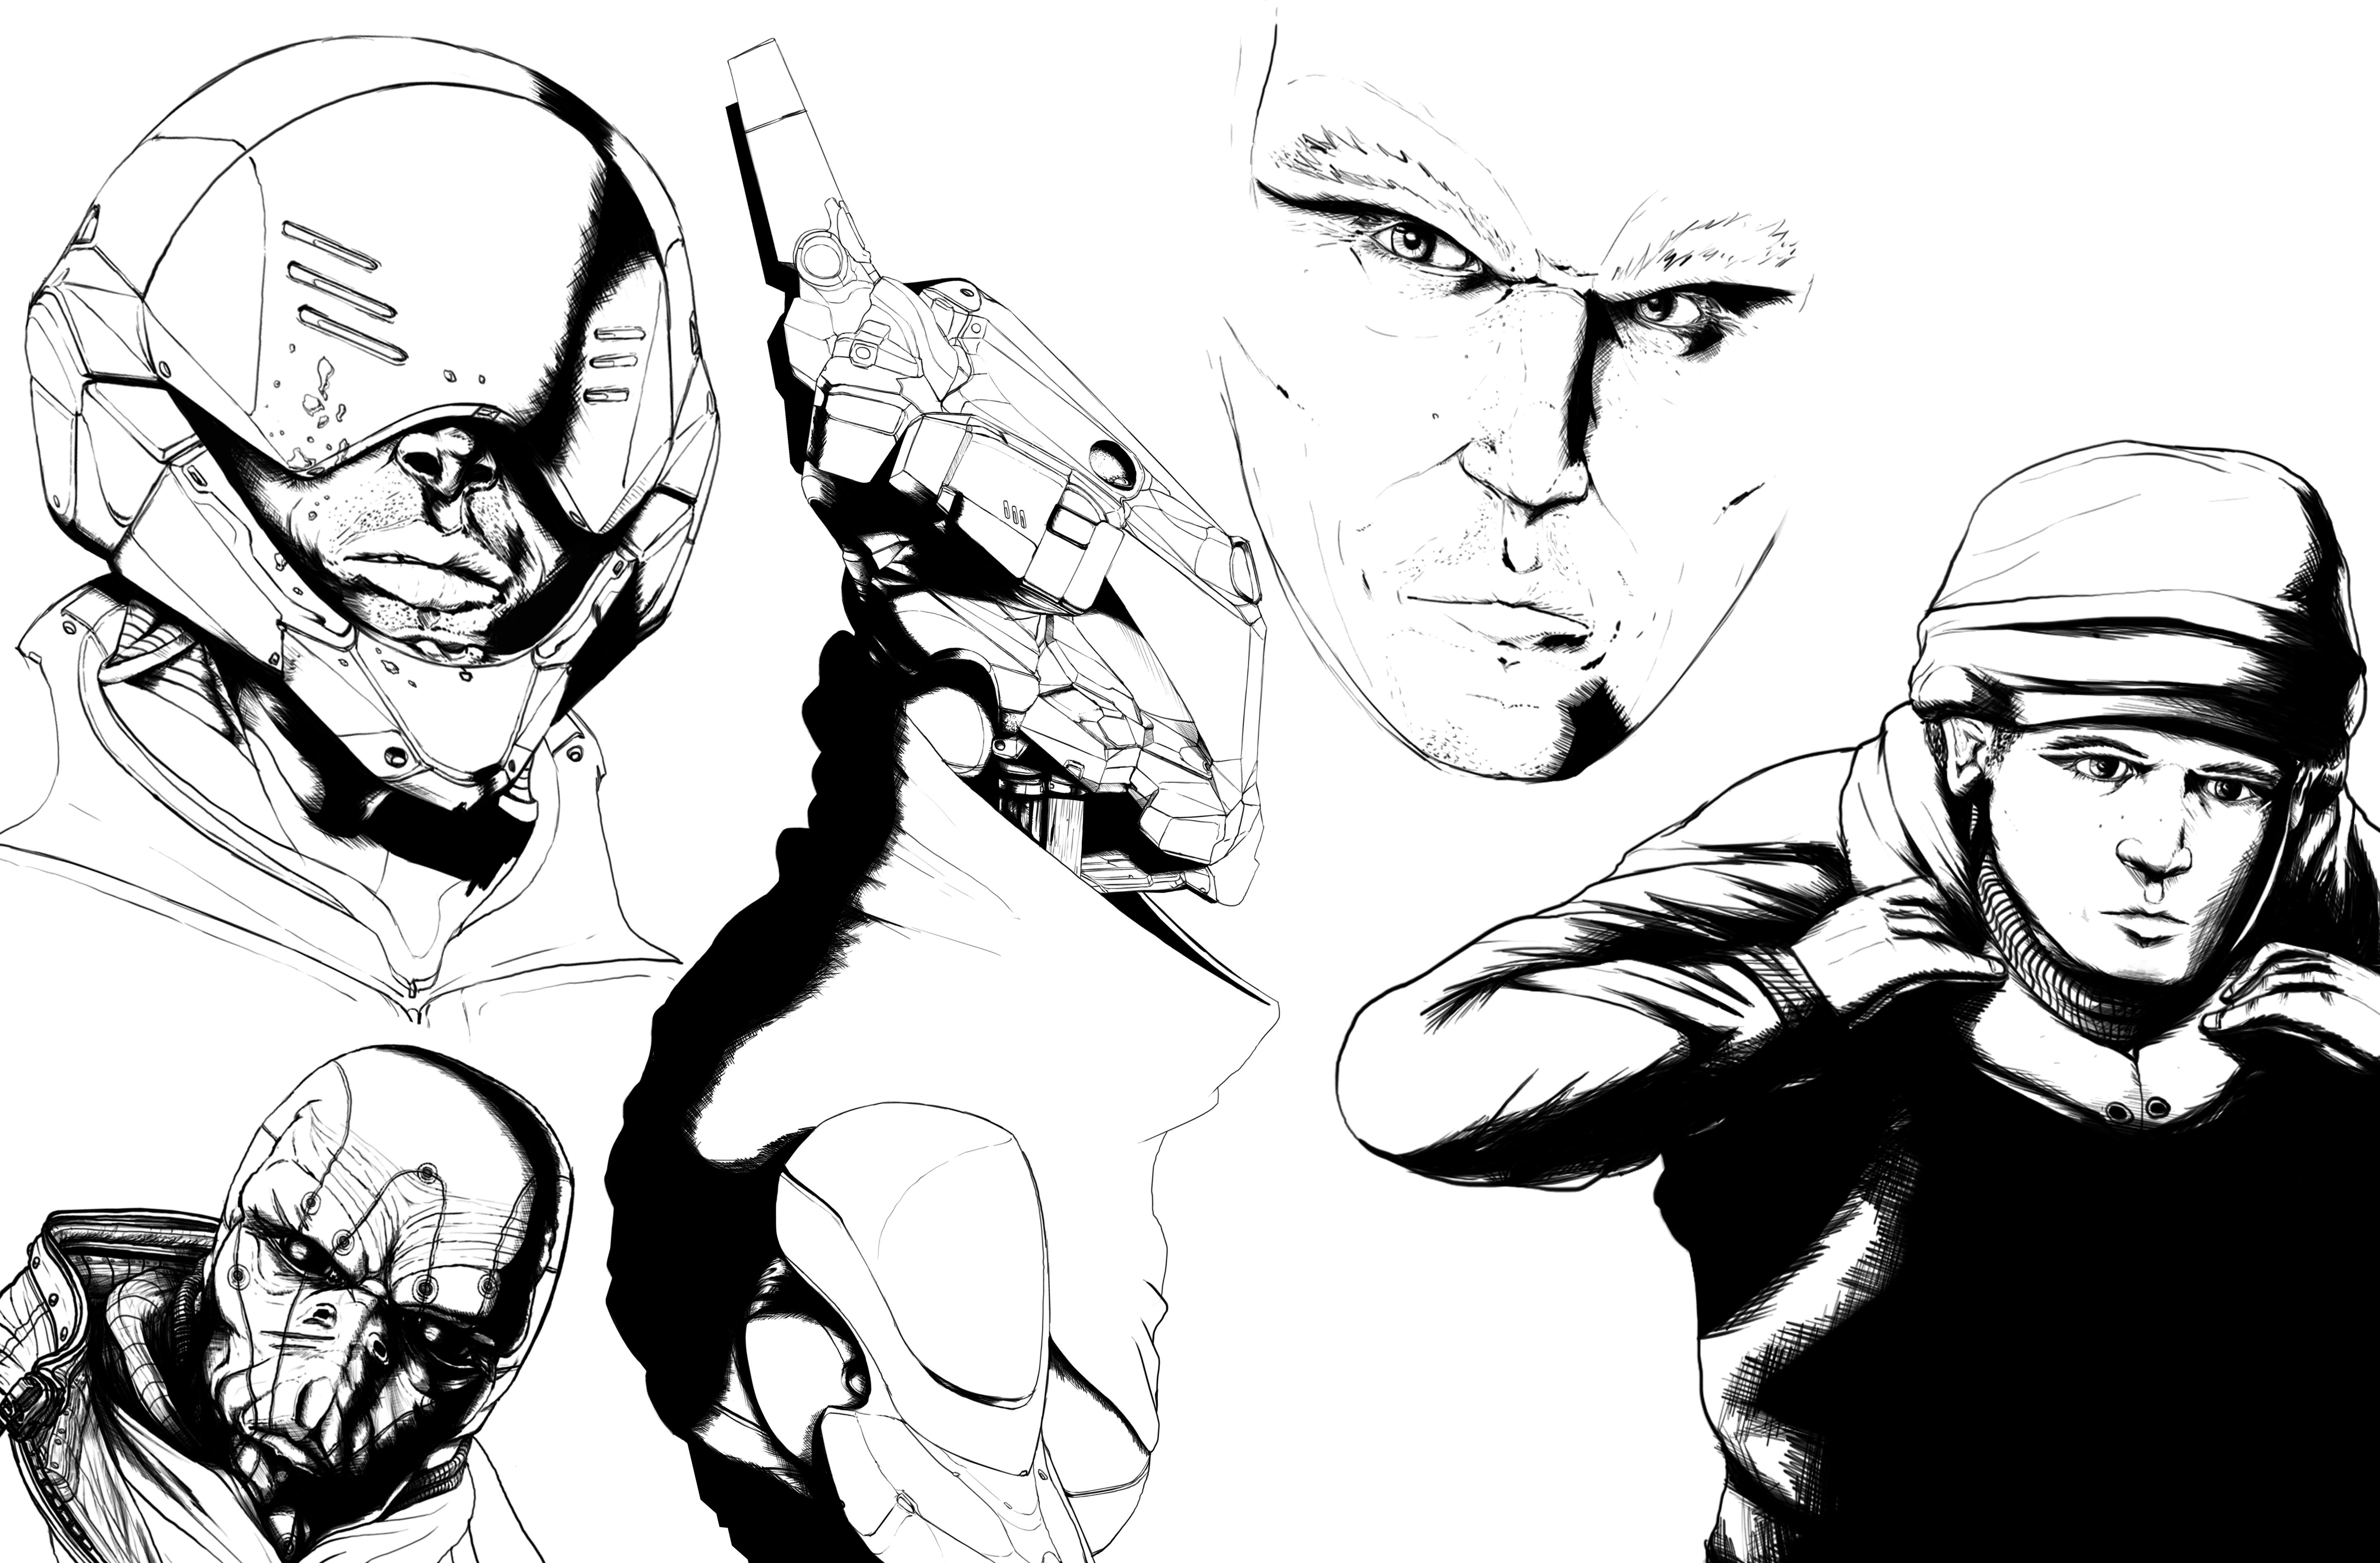 Stuff from my comic book.